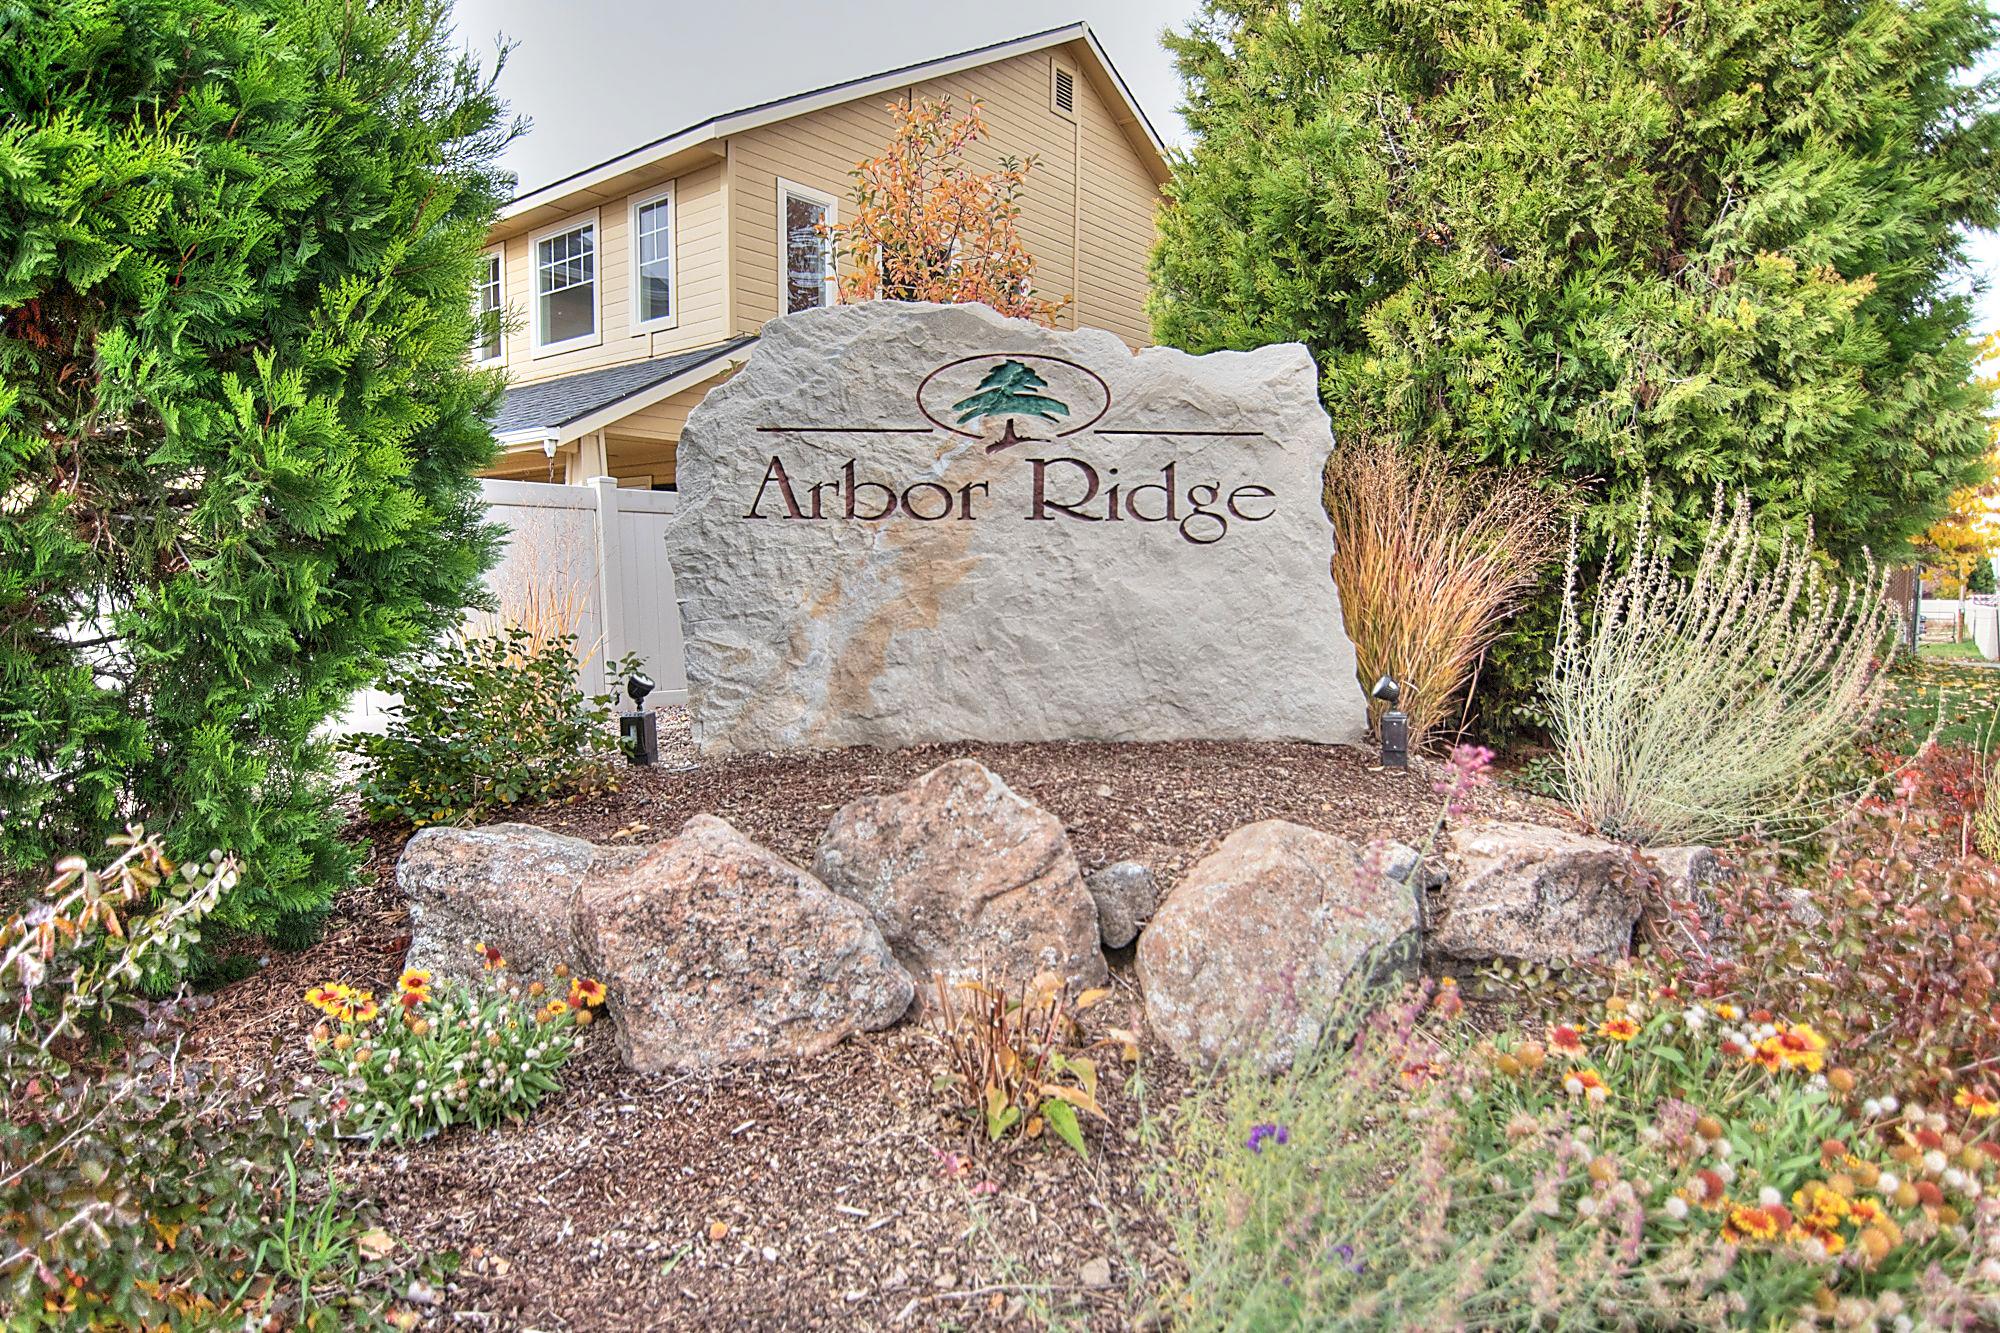 cbh-homes-arbor-ridge-1.jpg